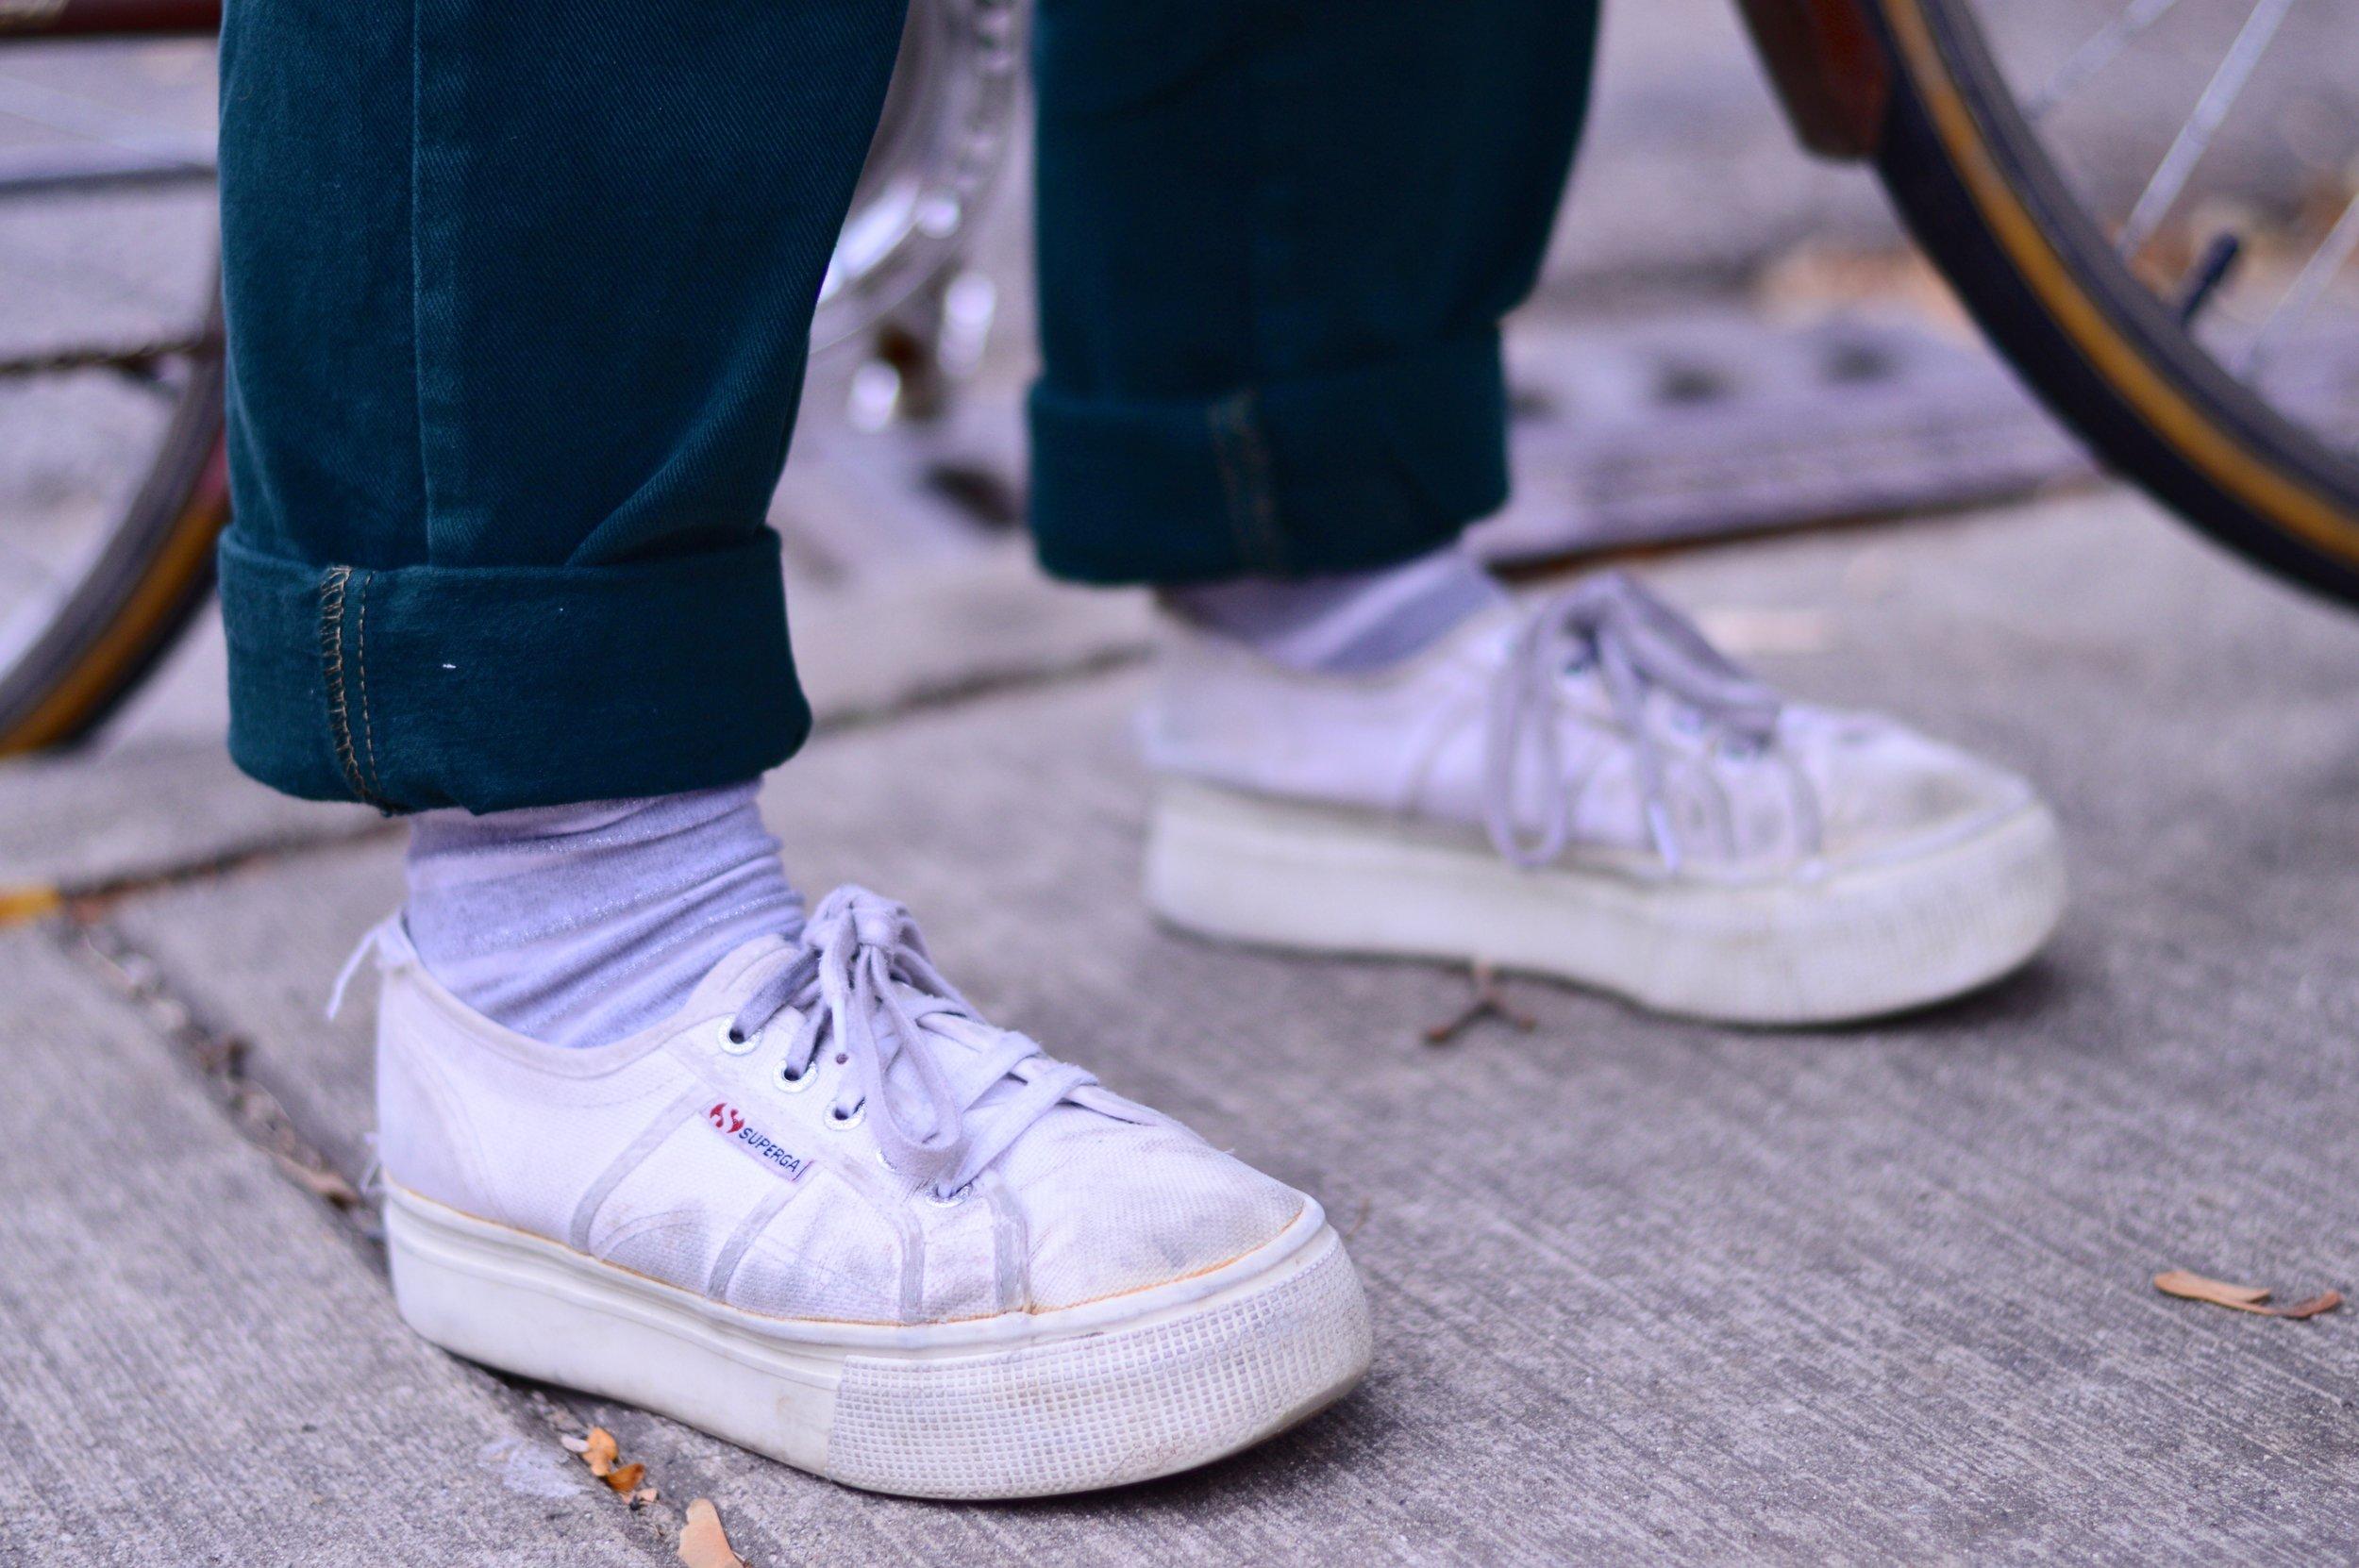 Superga shoes  Instagram  @nbnbnb_   Photo- Beth Jackson